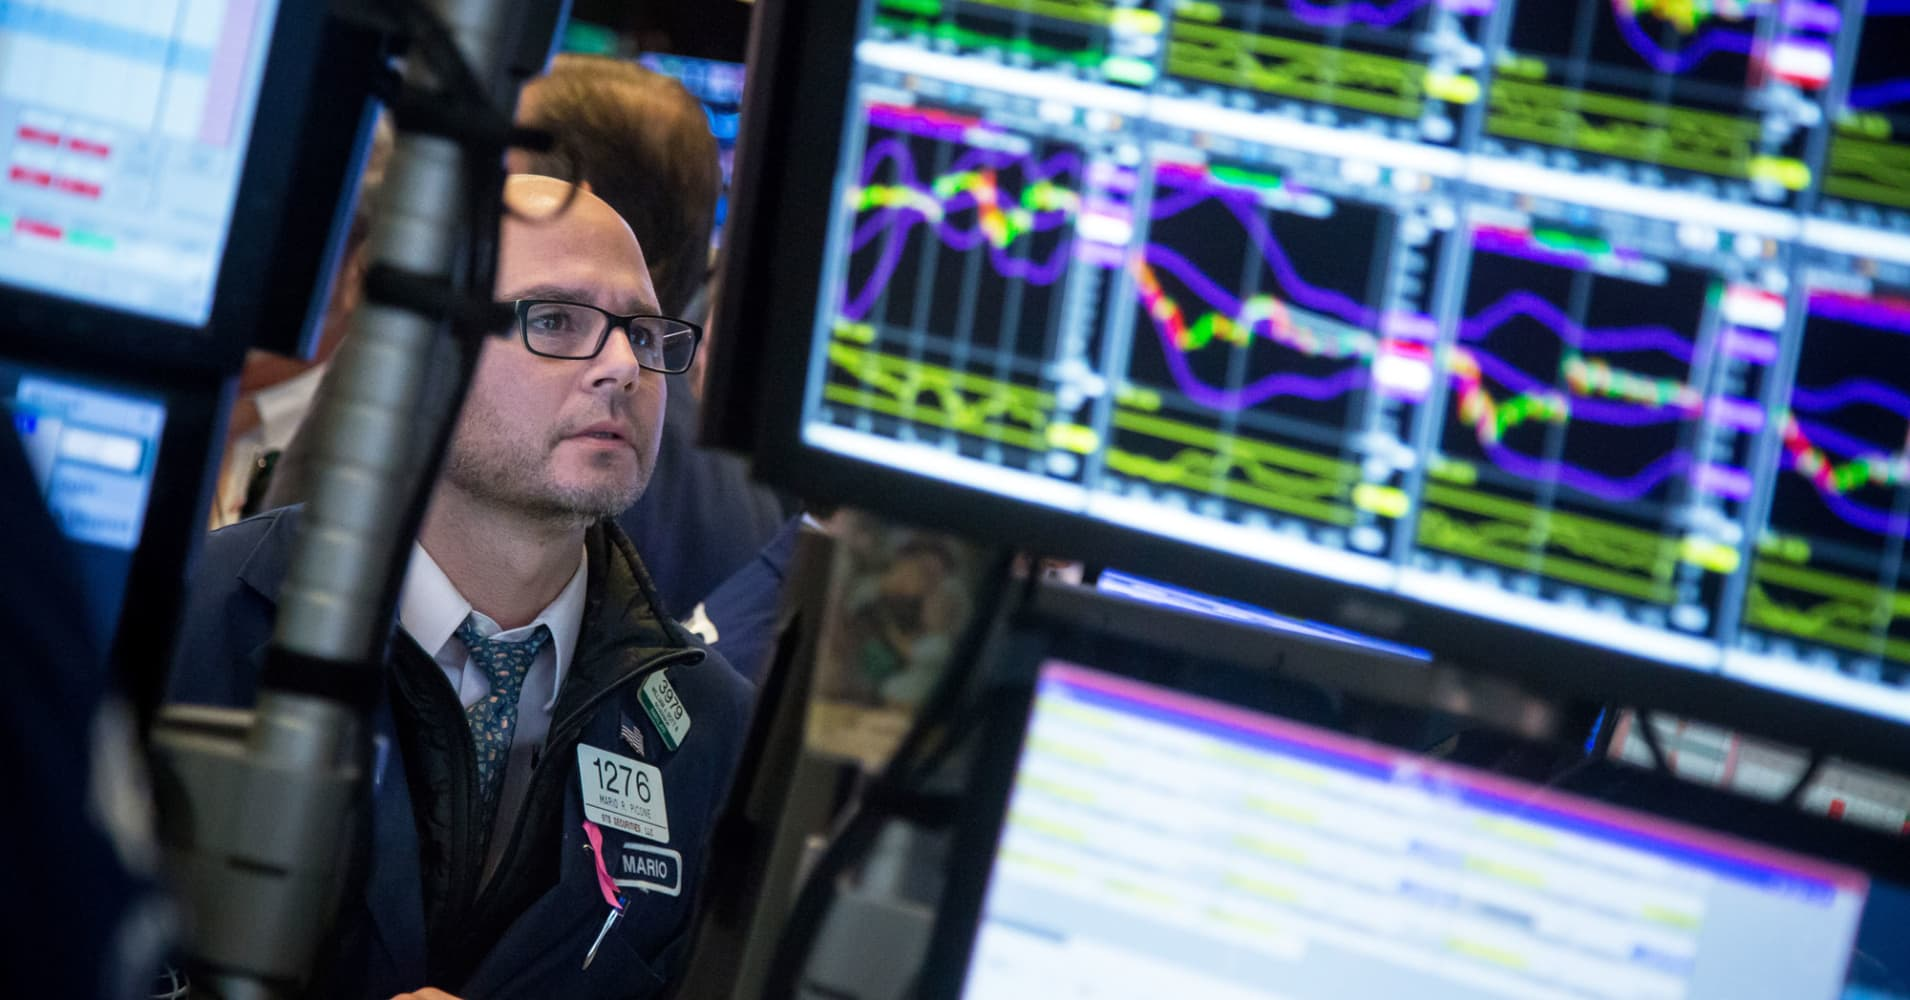 Stocks making the biggest moves premarket: Hormel, Apple, Nike, Domino's Pizza & more